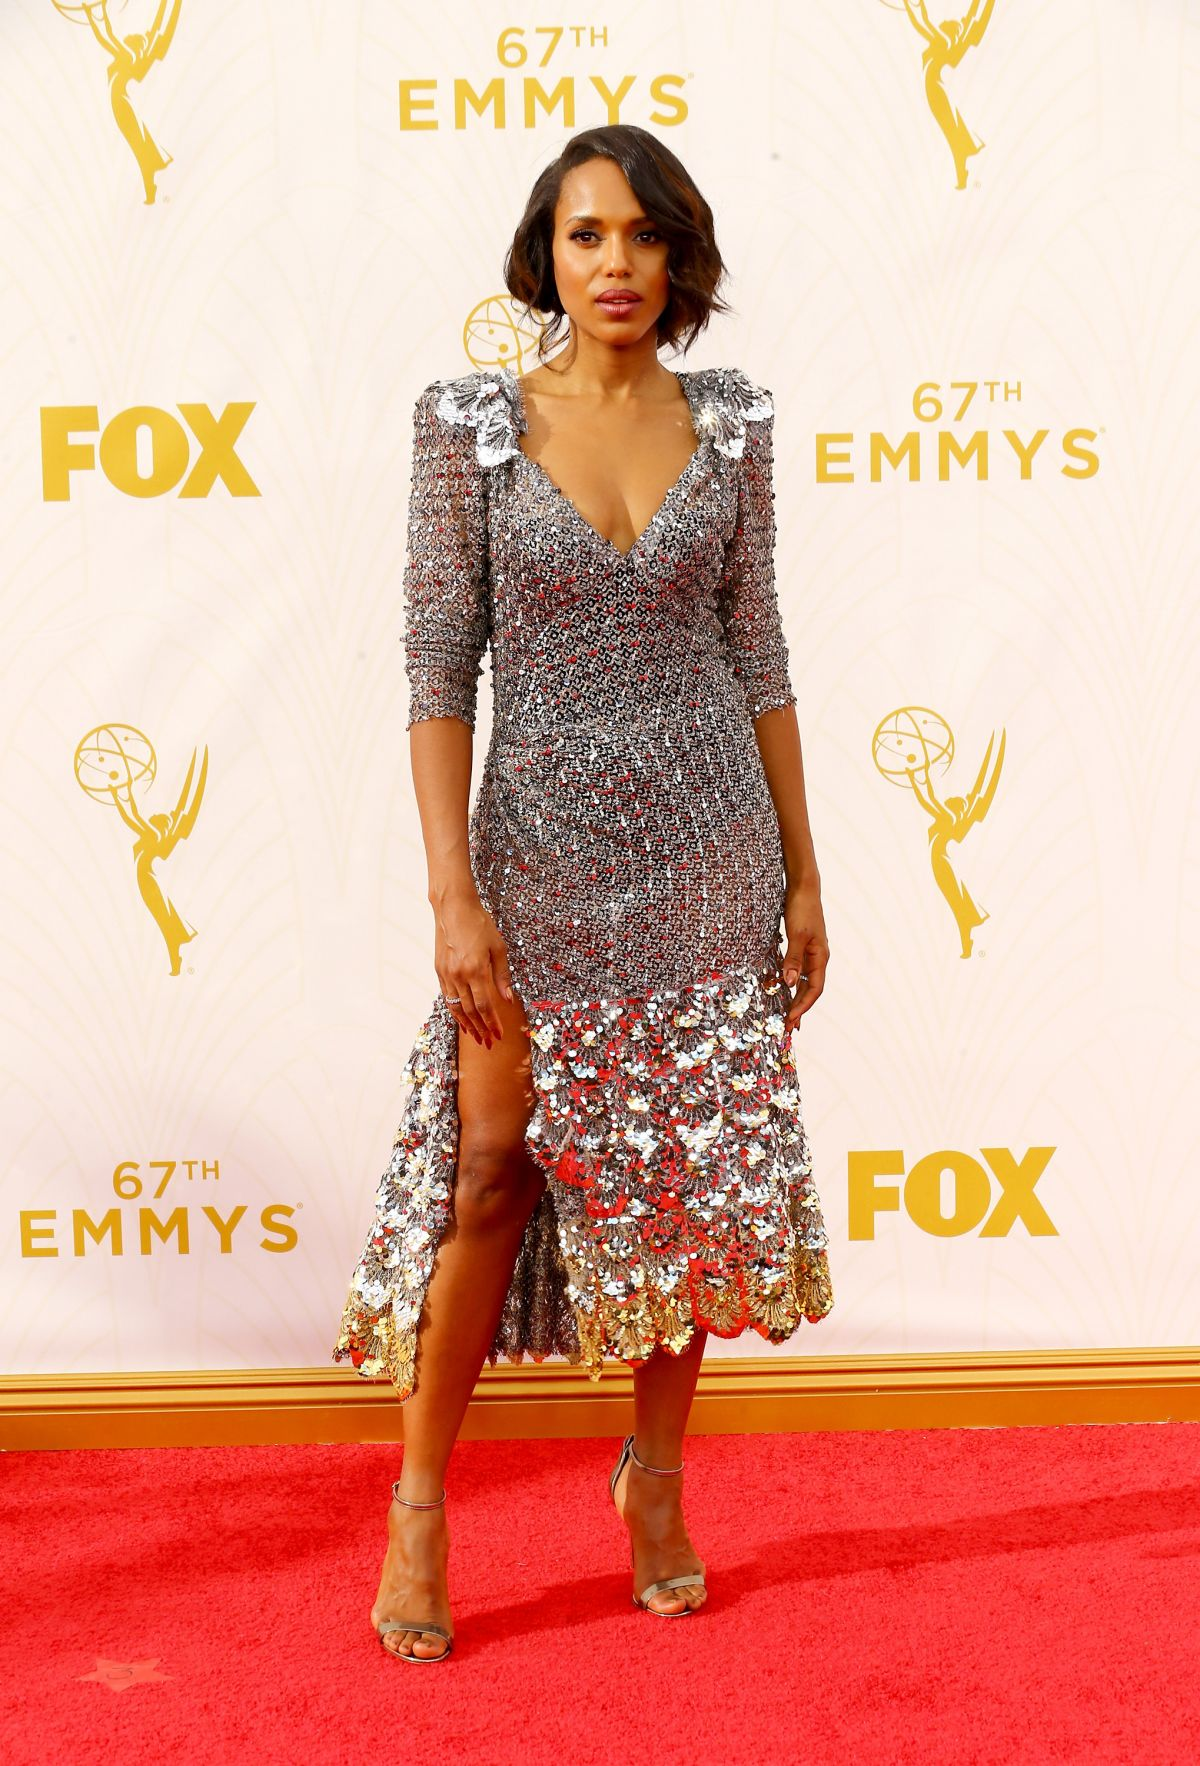 2015 Los Angeles Film Festival: KERRY WASHINGTON At 2015 Emmy Awards In Los Angeles 09/20